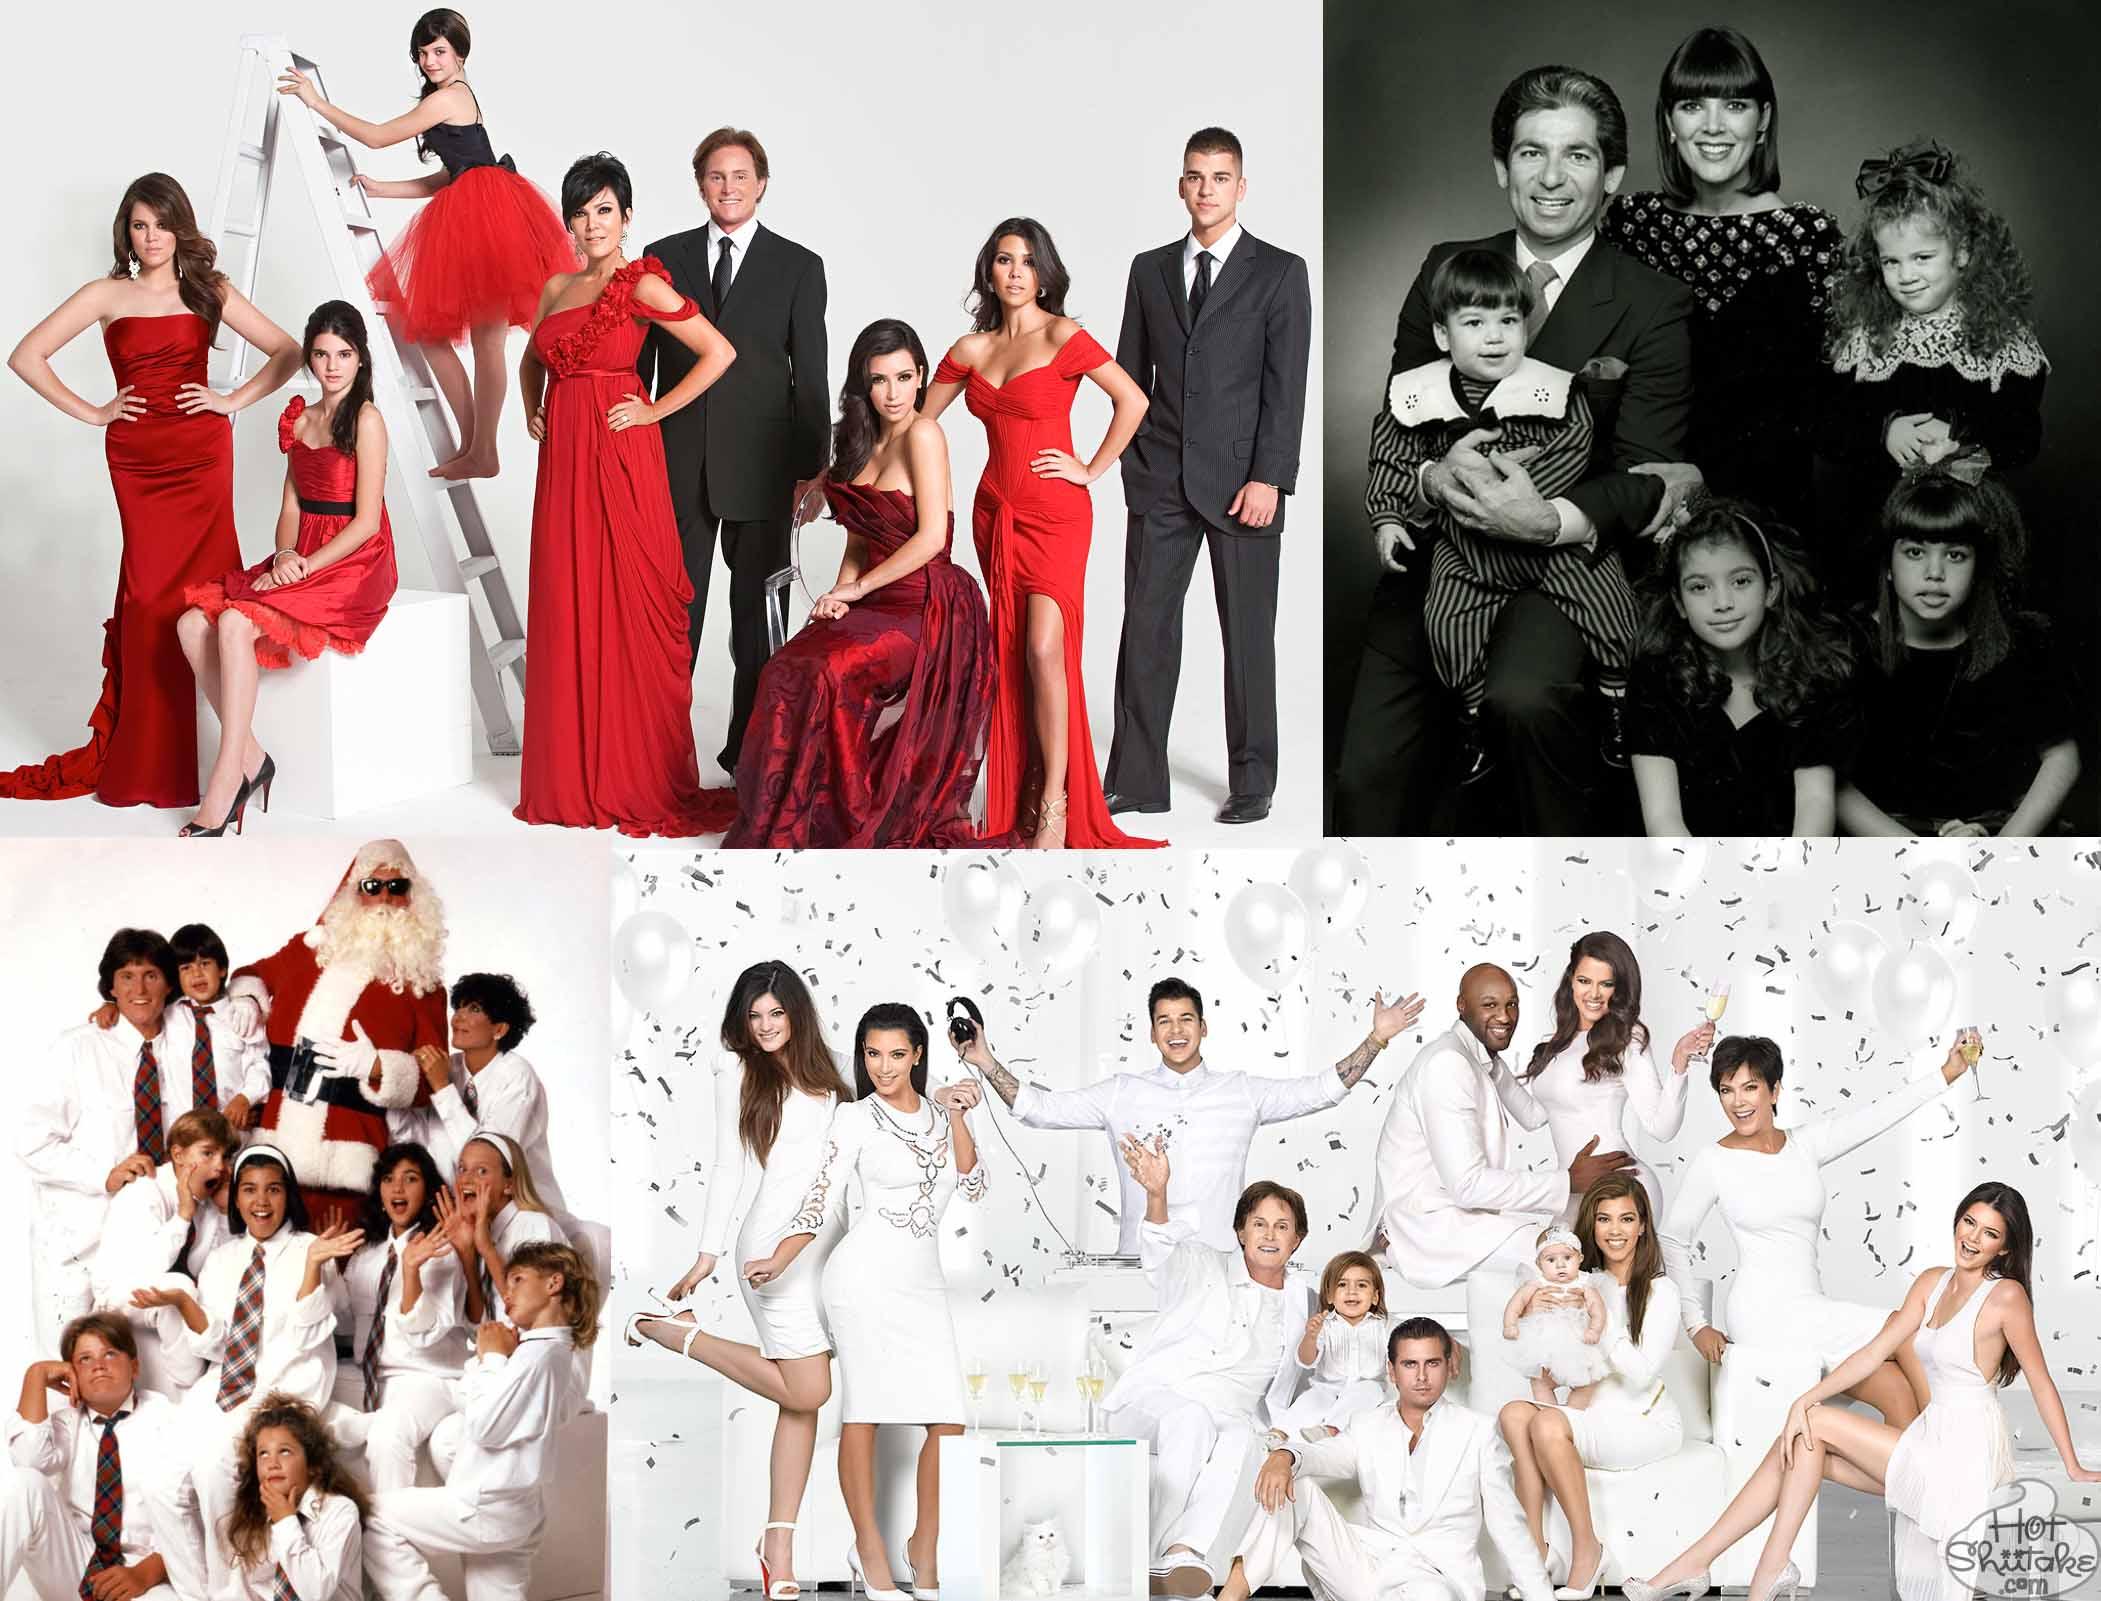 Kardashian Family Christmas Cards Over The Years